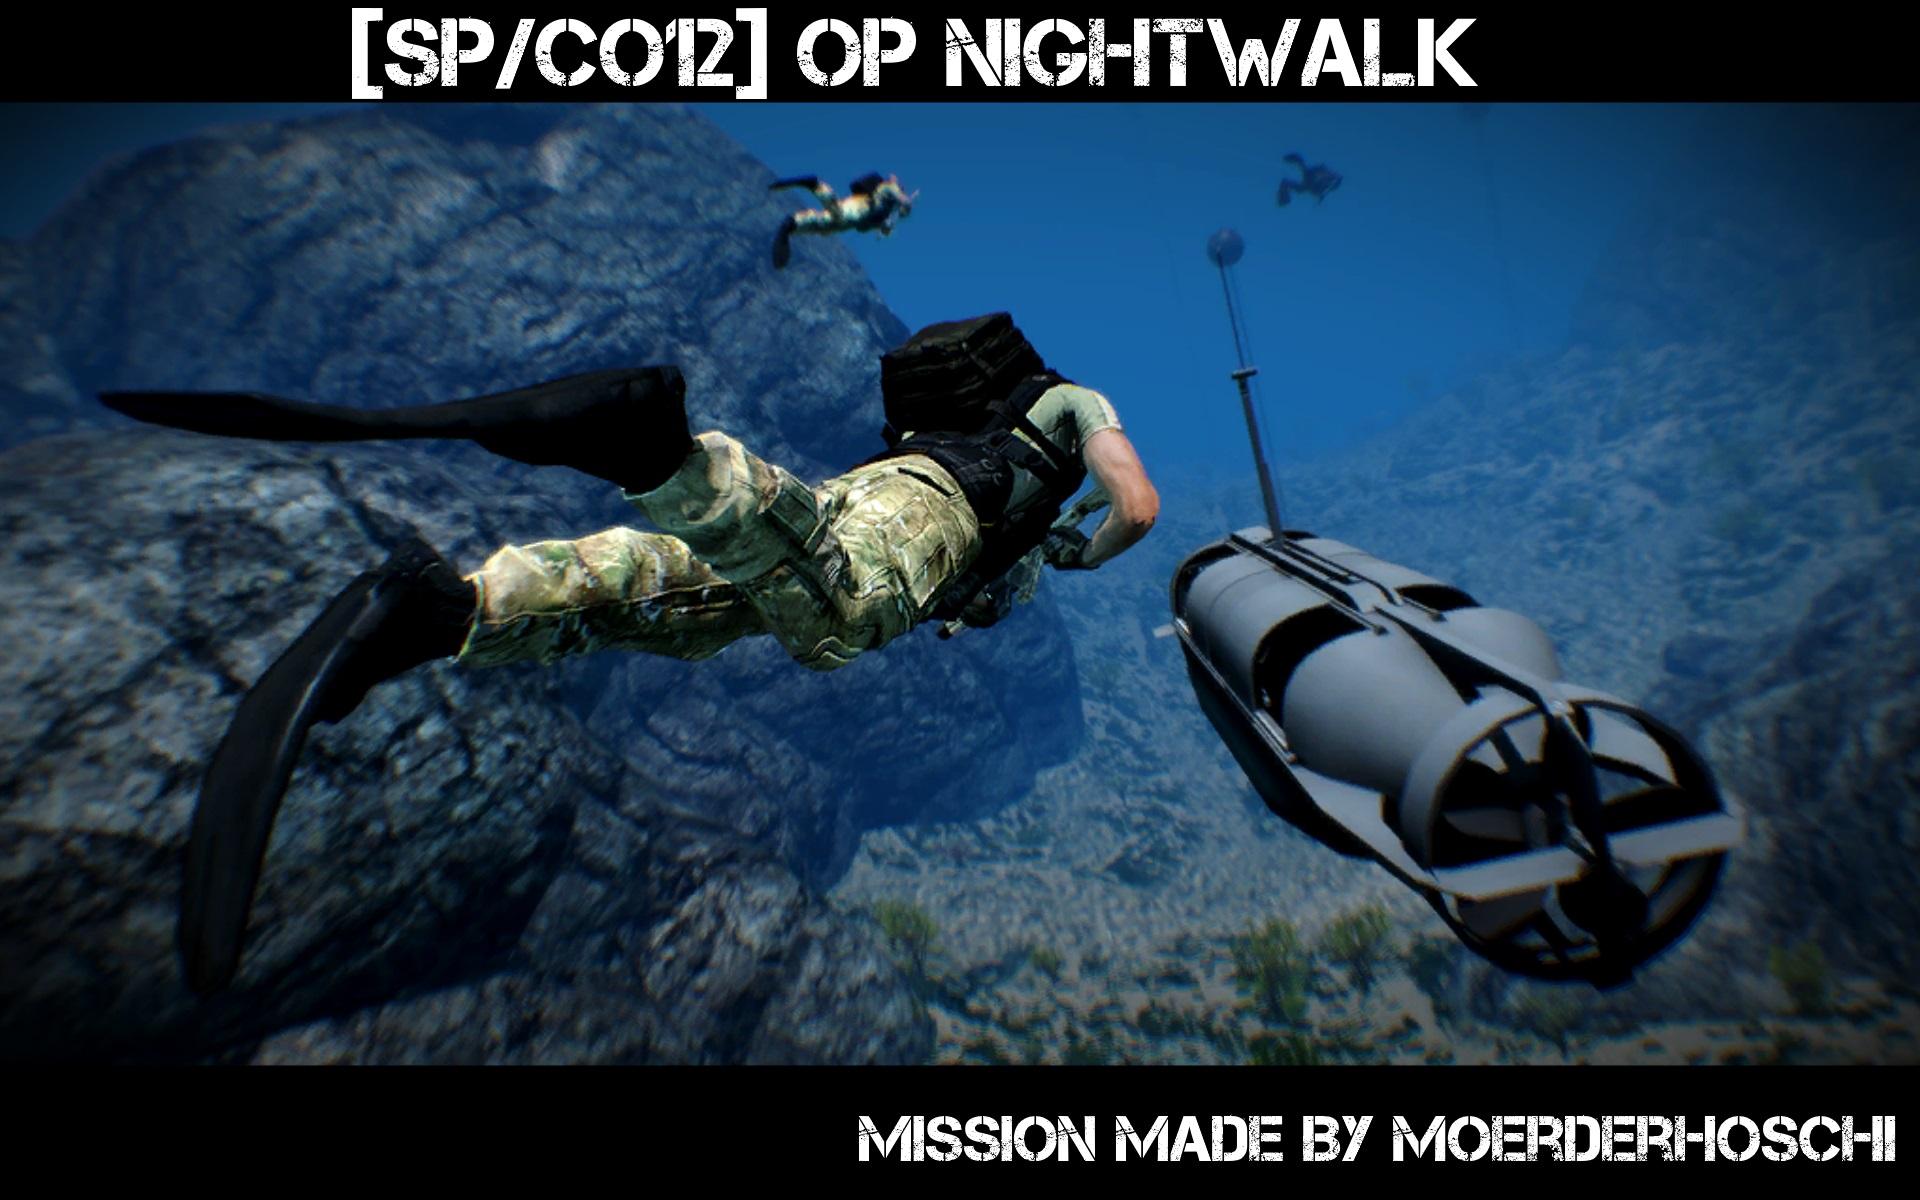 OP Nightwalk